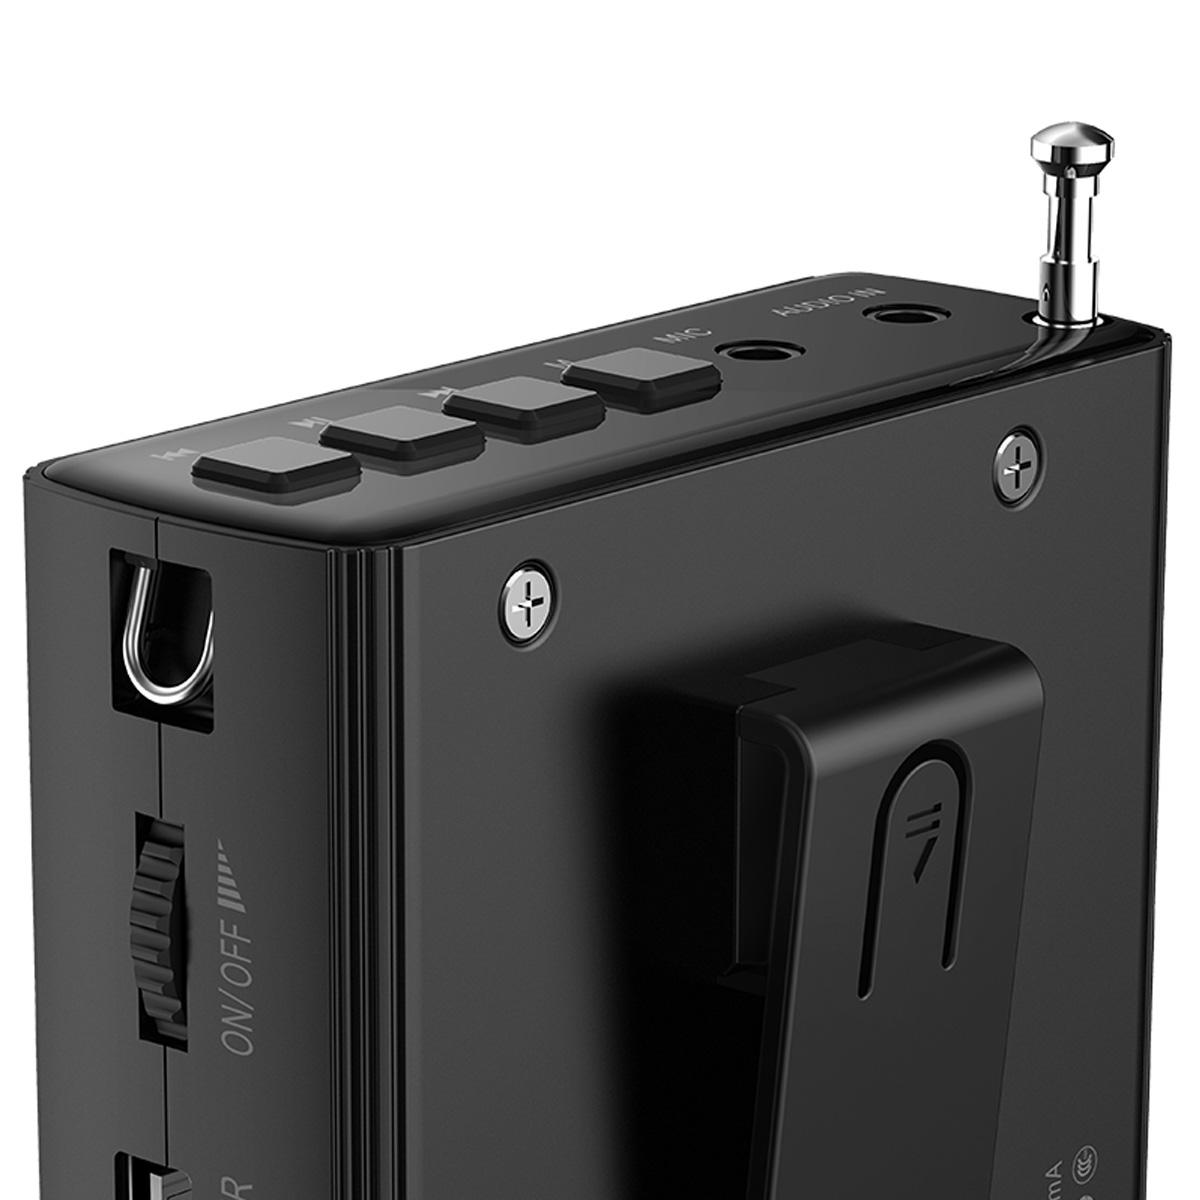 Winbridge winbridge voice amplifier factory for sale-1